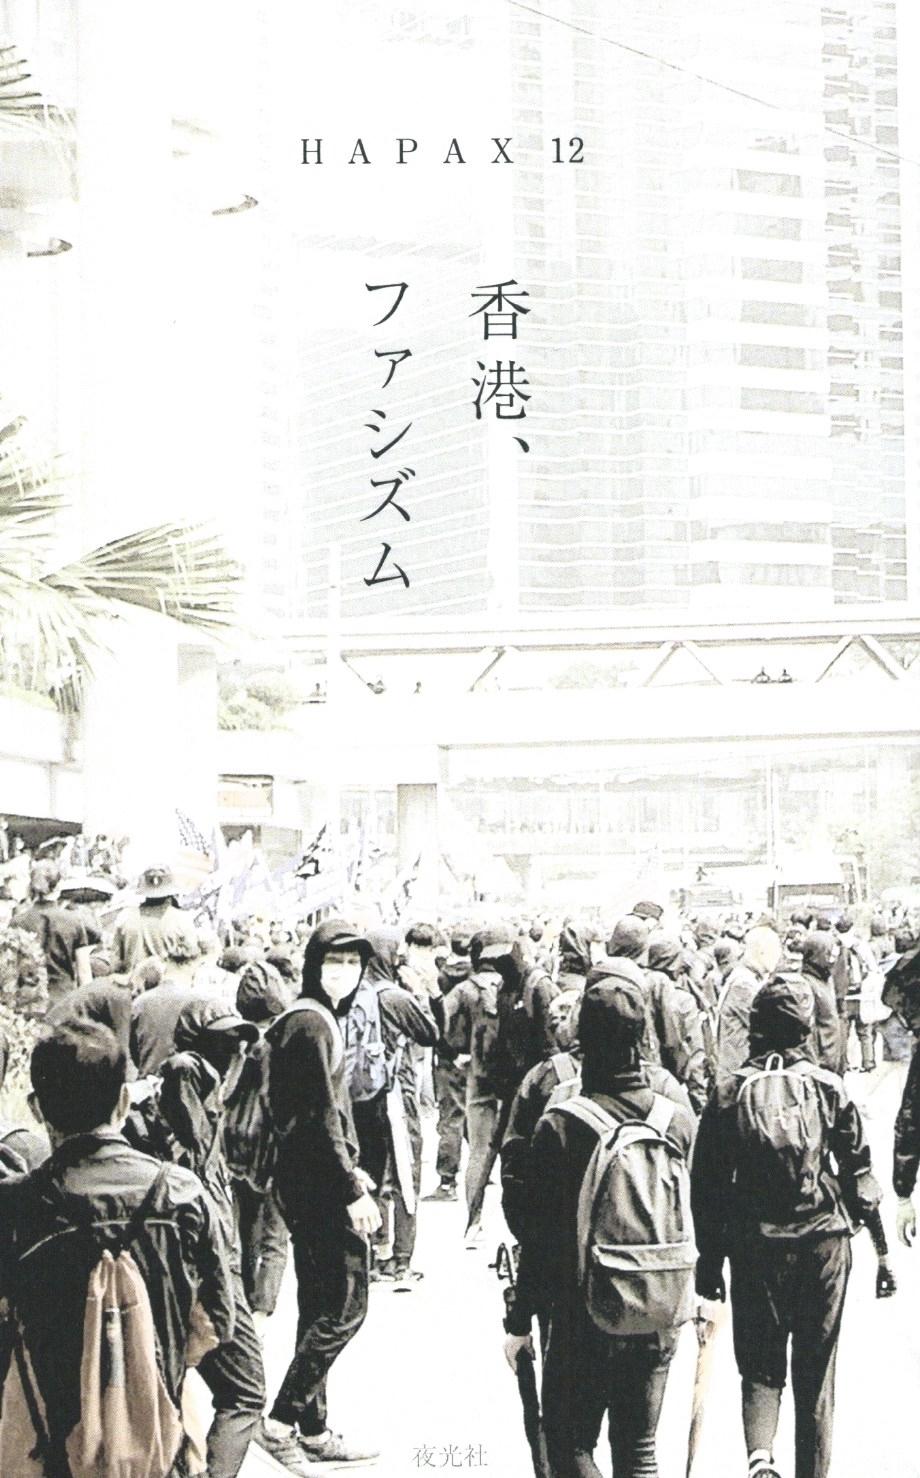 HAPAX 12 香港、ファシズム